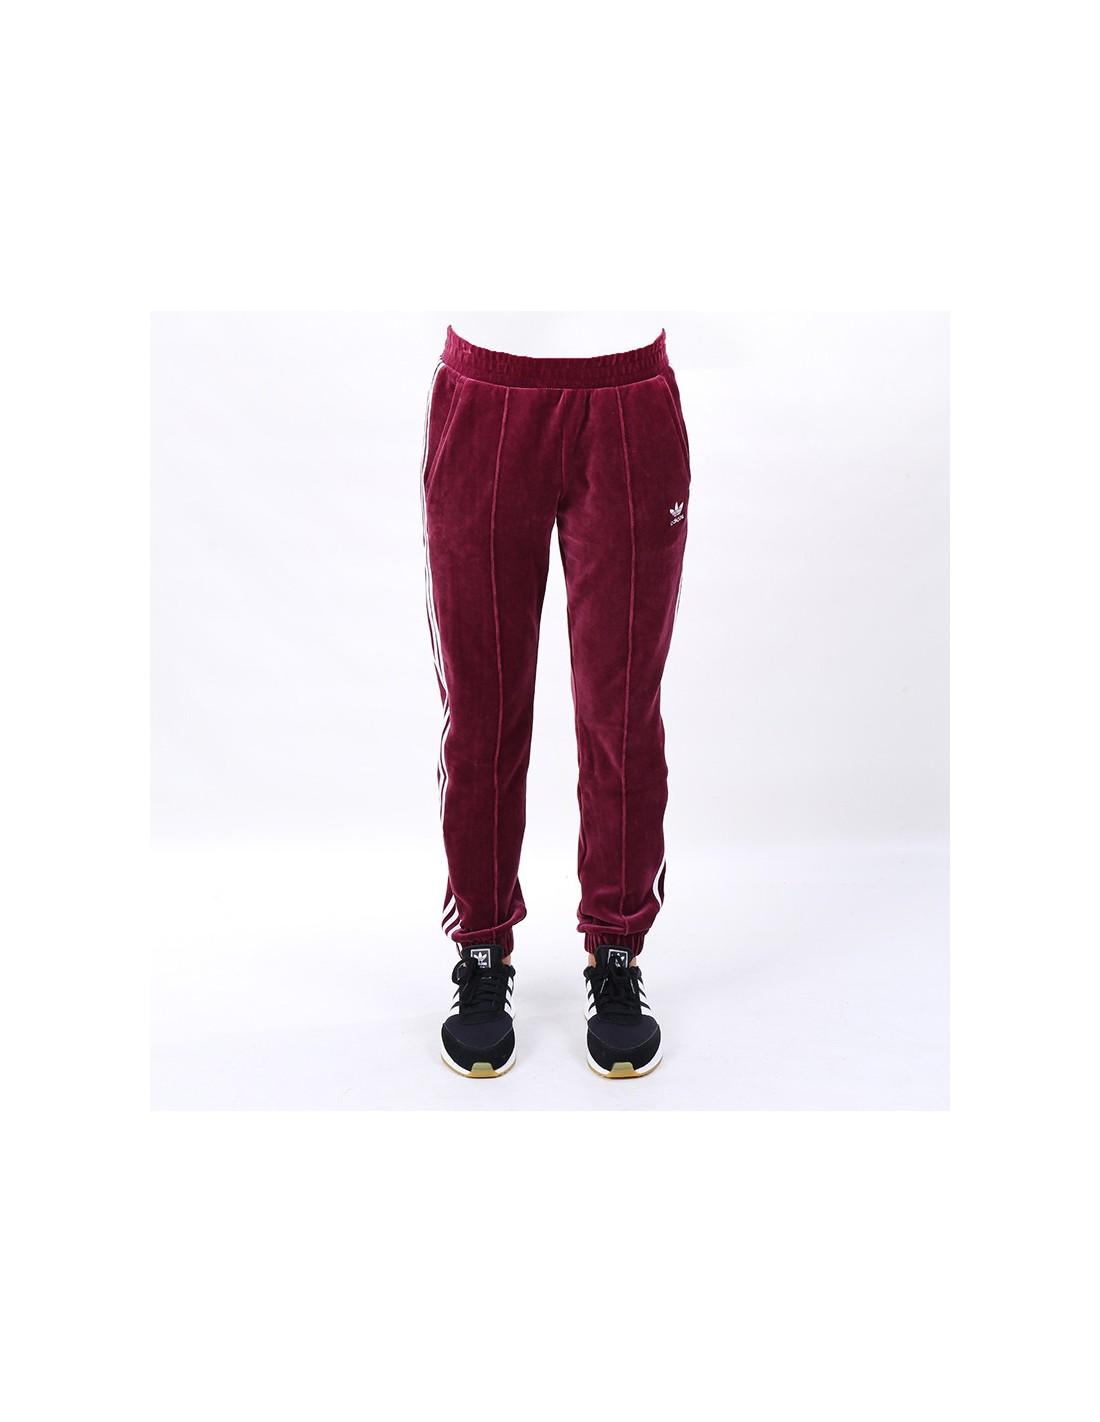 San Francisco eb1d9 e2783 Discover all collection clothing Adidas fall winter DH3114 ...